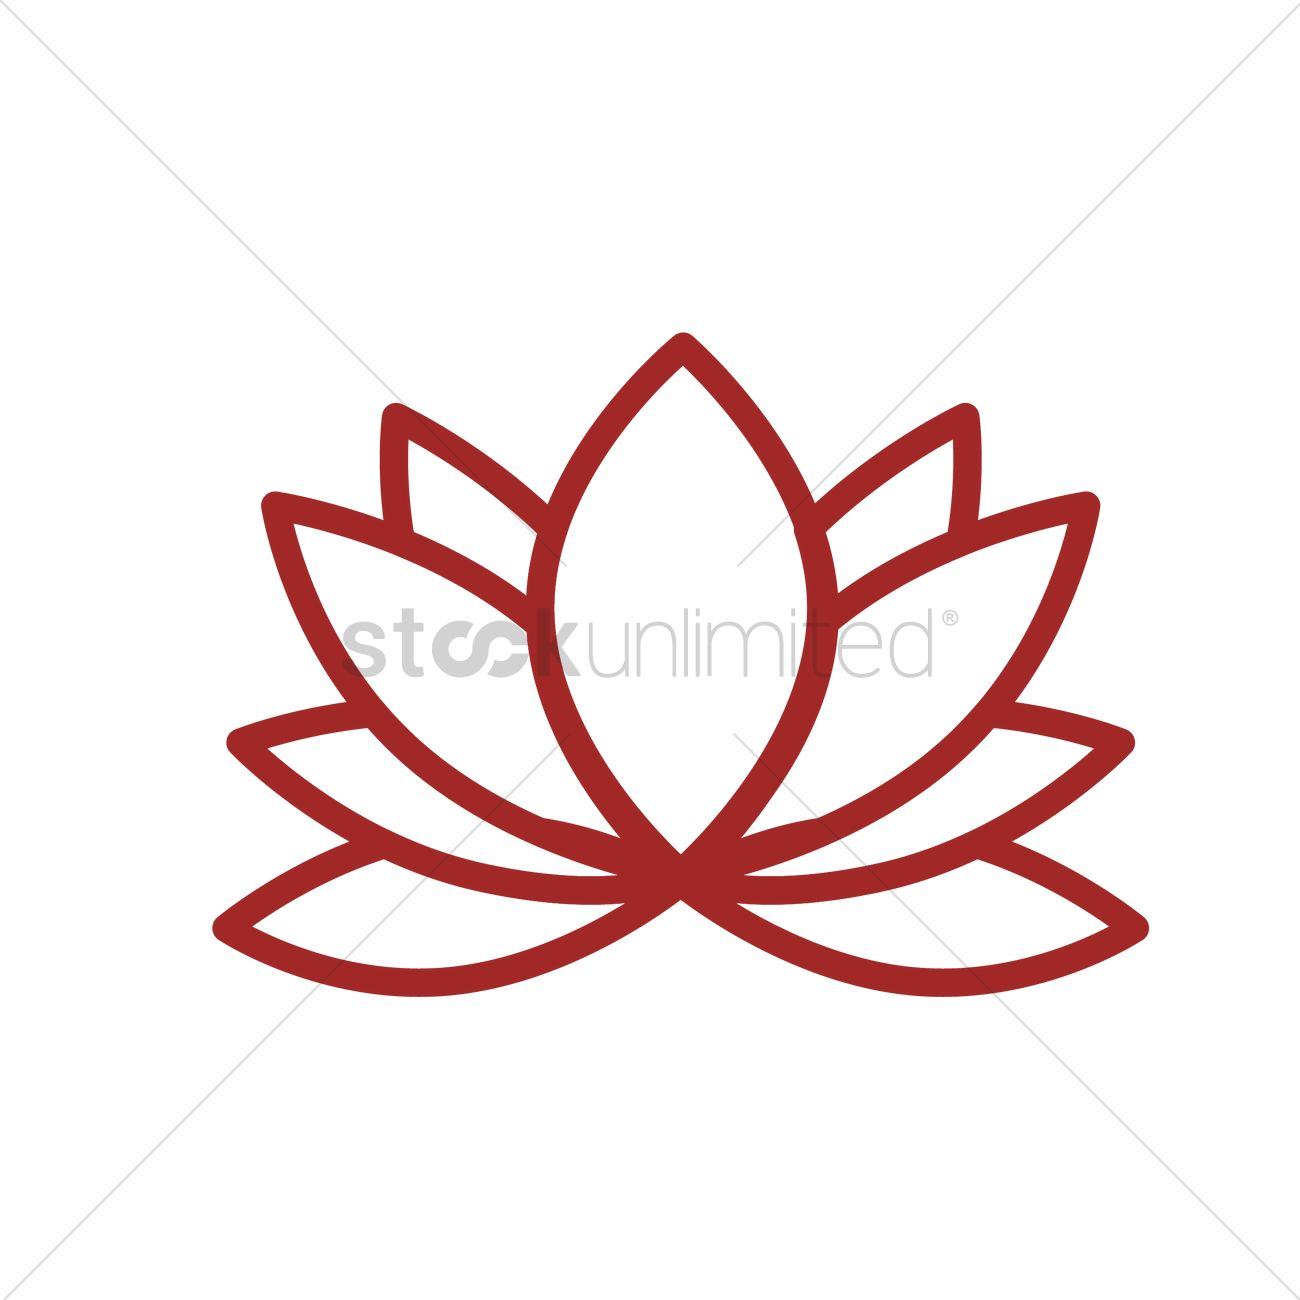 Lotus flower vector image 1970242 stockunlimited lotus flower vector graphic izmirmasajfo